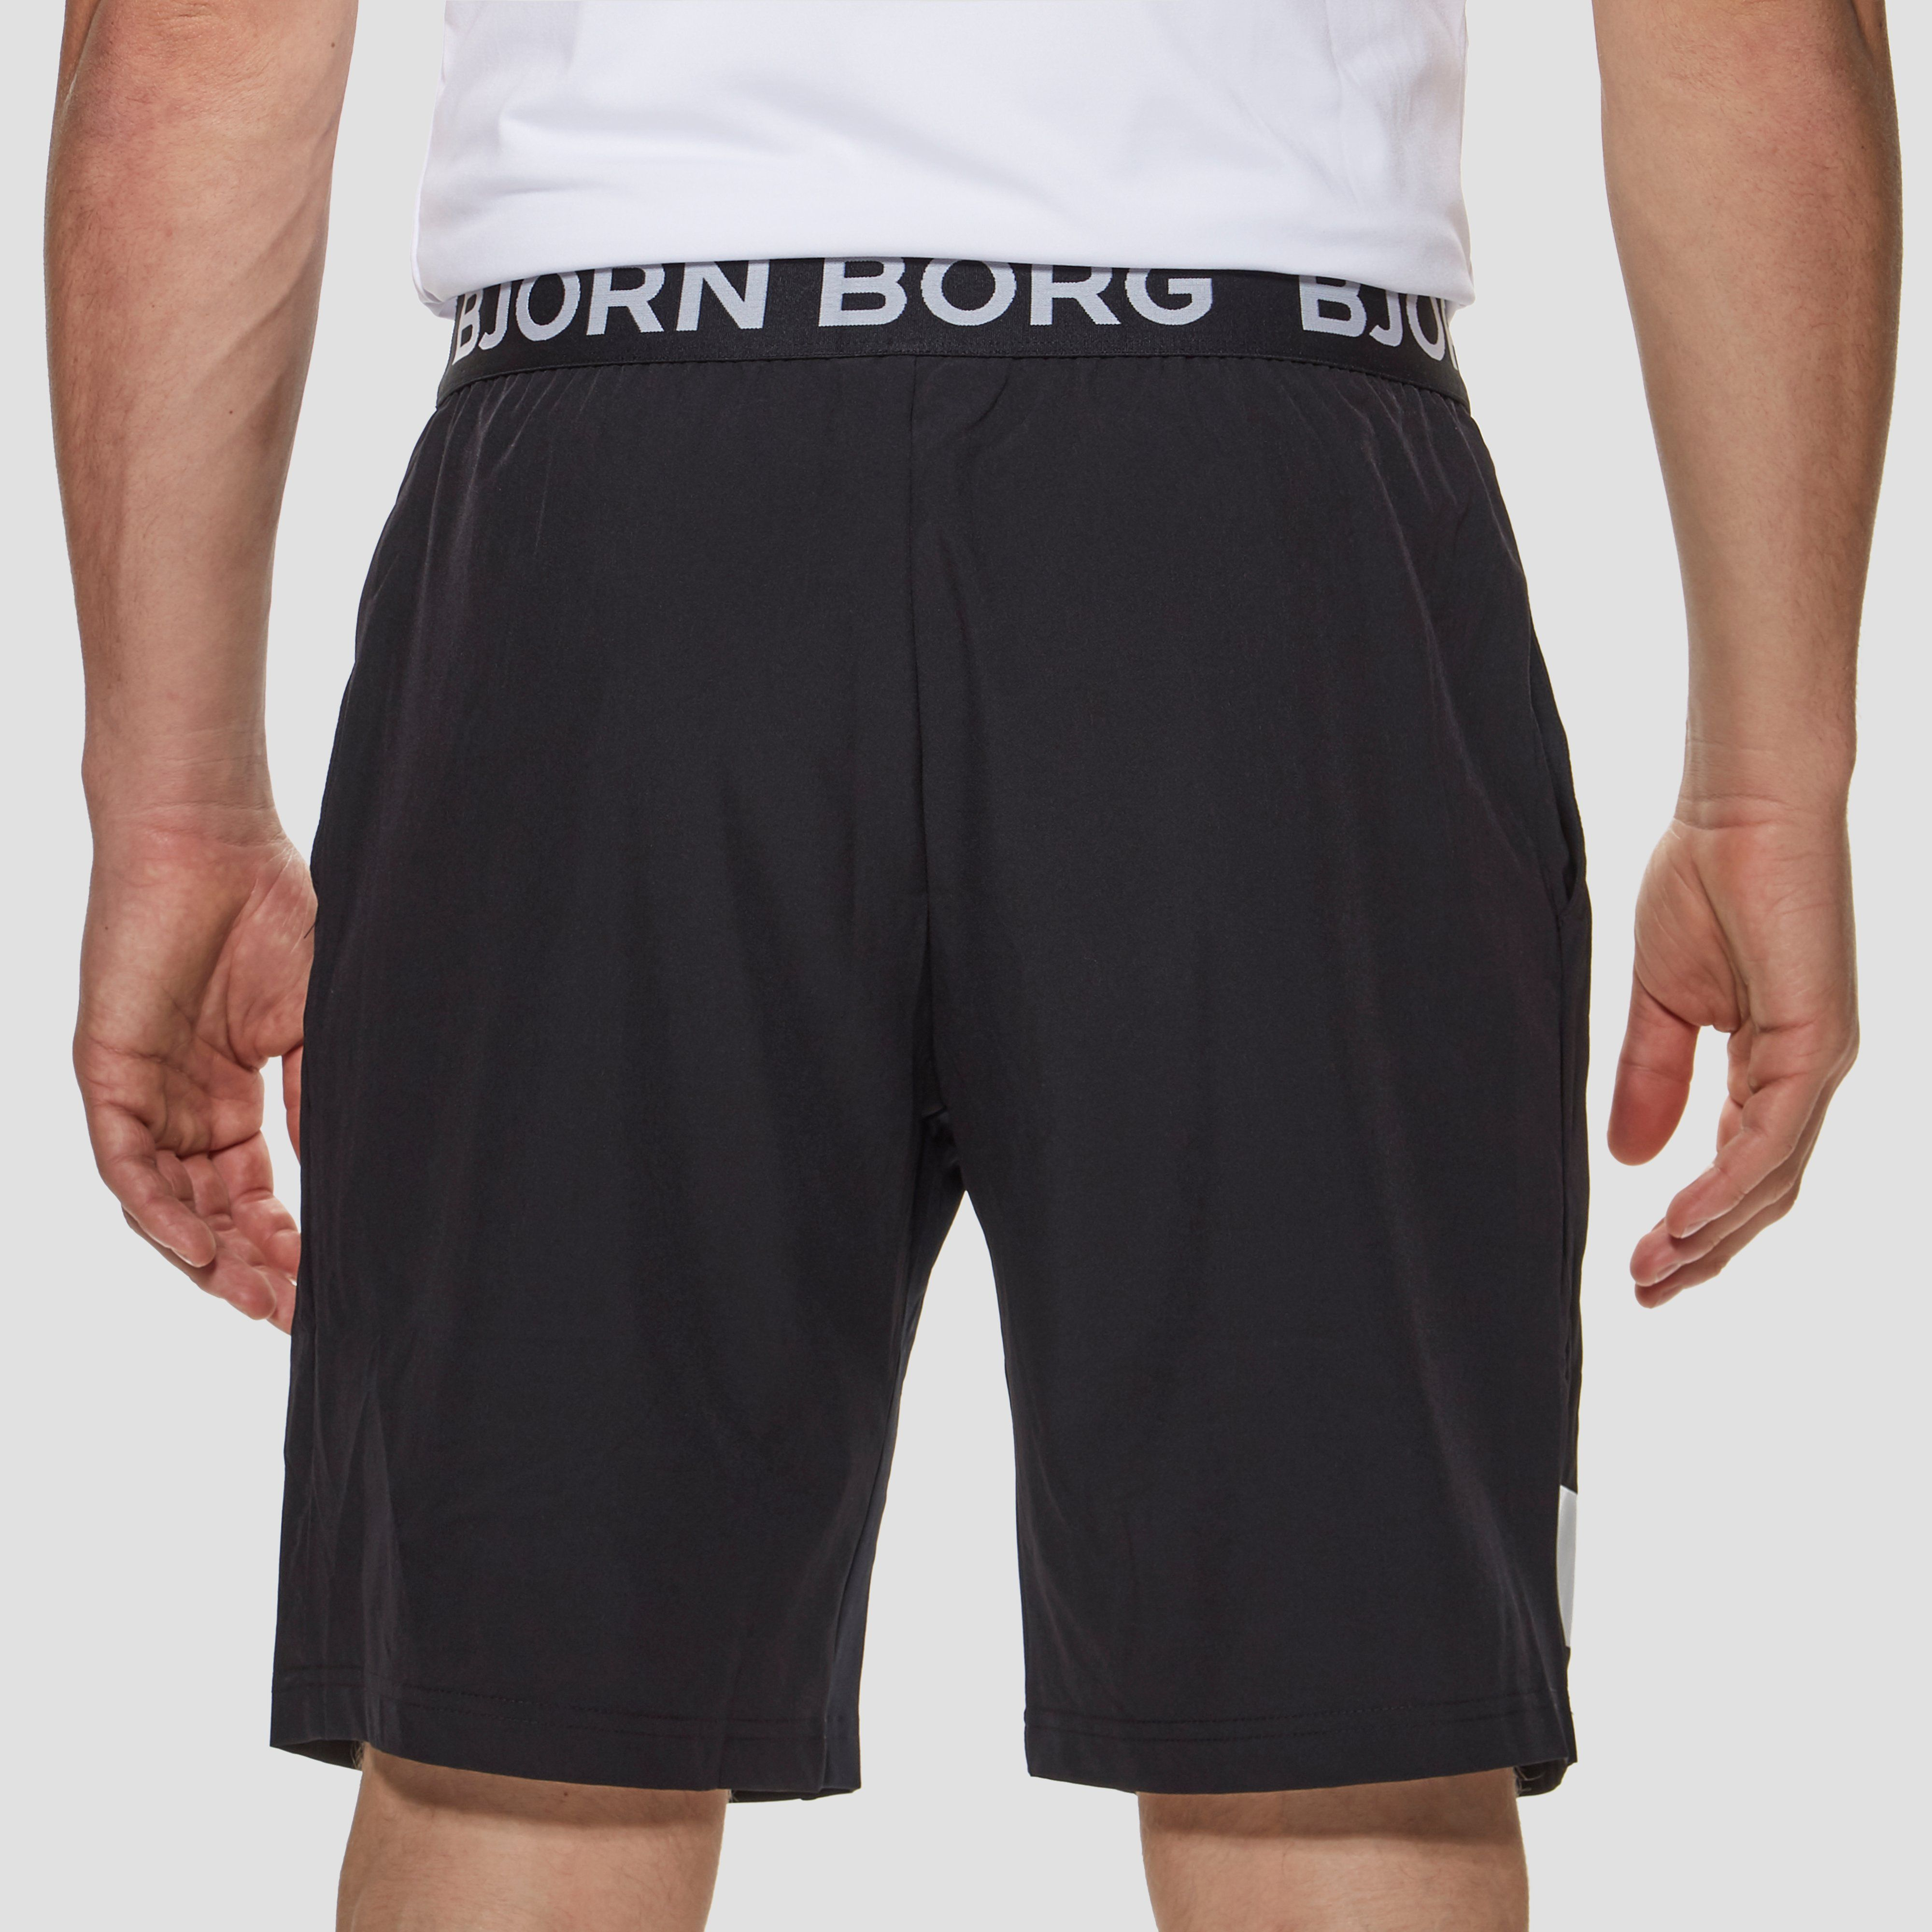 Bjorn Borg August Men's Training Shorts